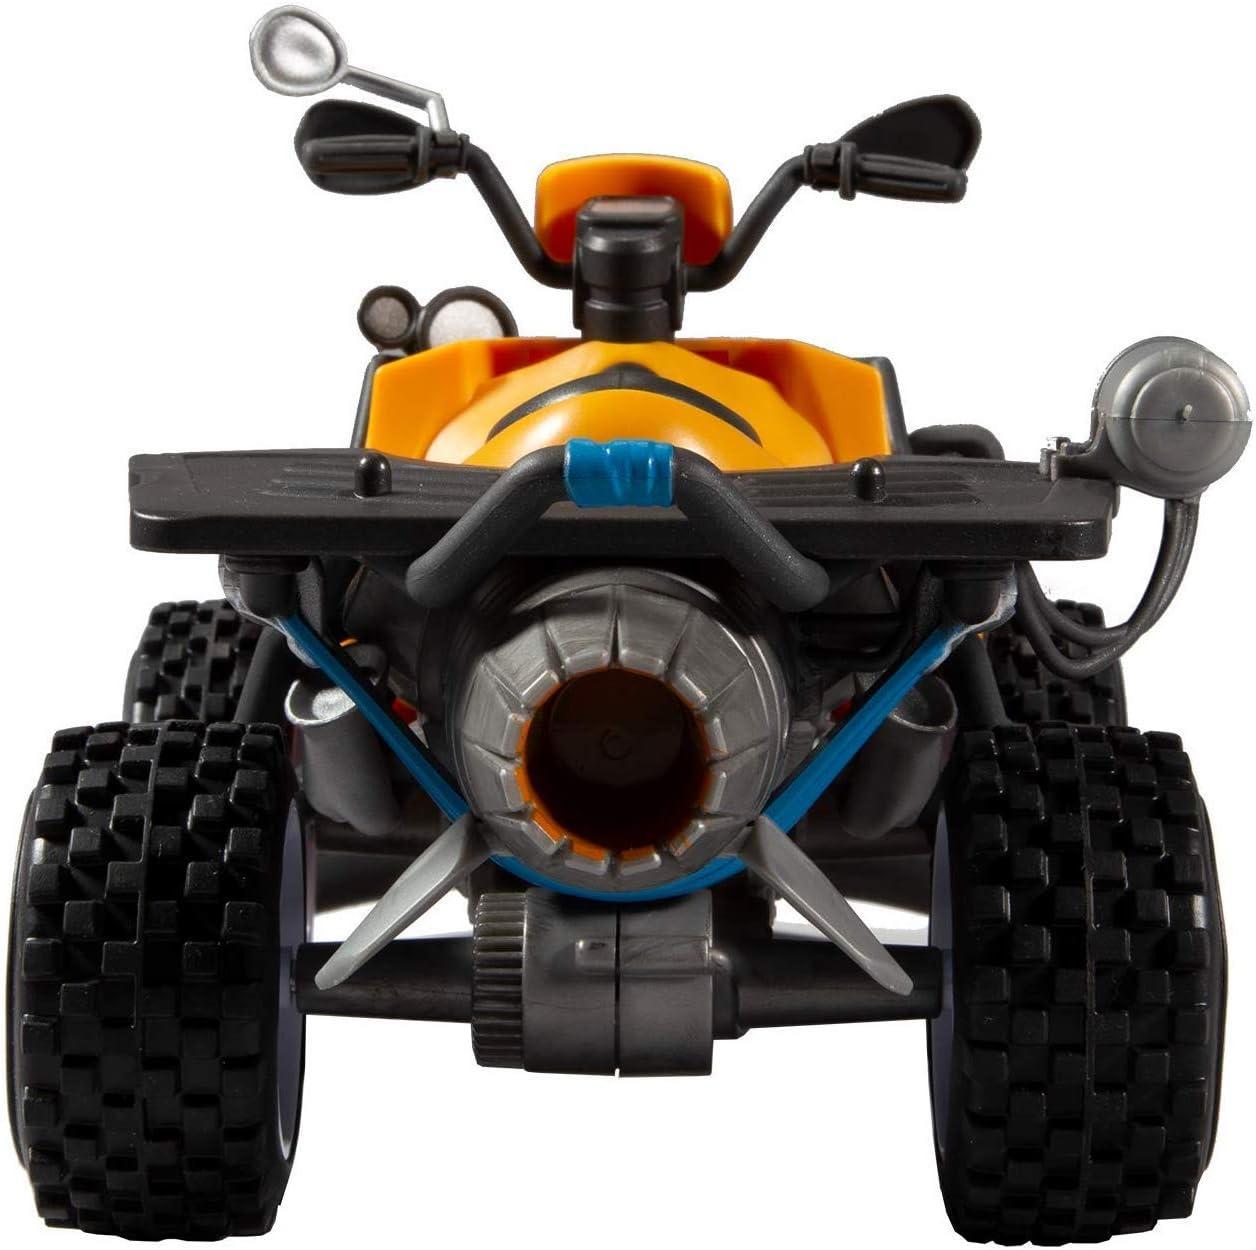 Fortnite Quadcrasher Vehicle Toy Amazon Com Mcfarlane Toys Fortnite Quadcrasher Vehiculo De Accion Multicolor Toys Games